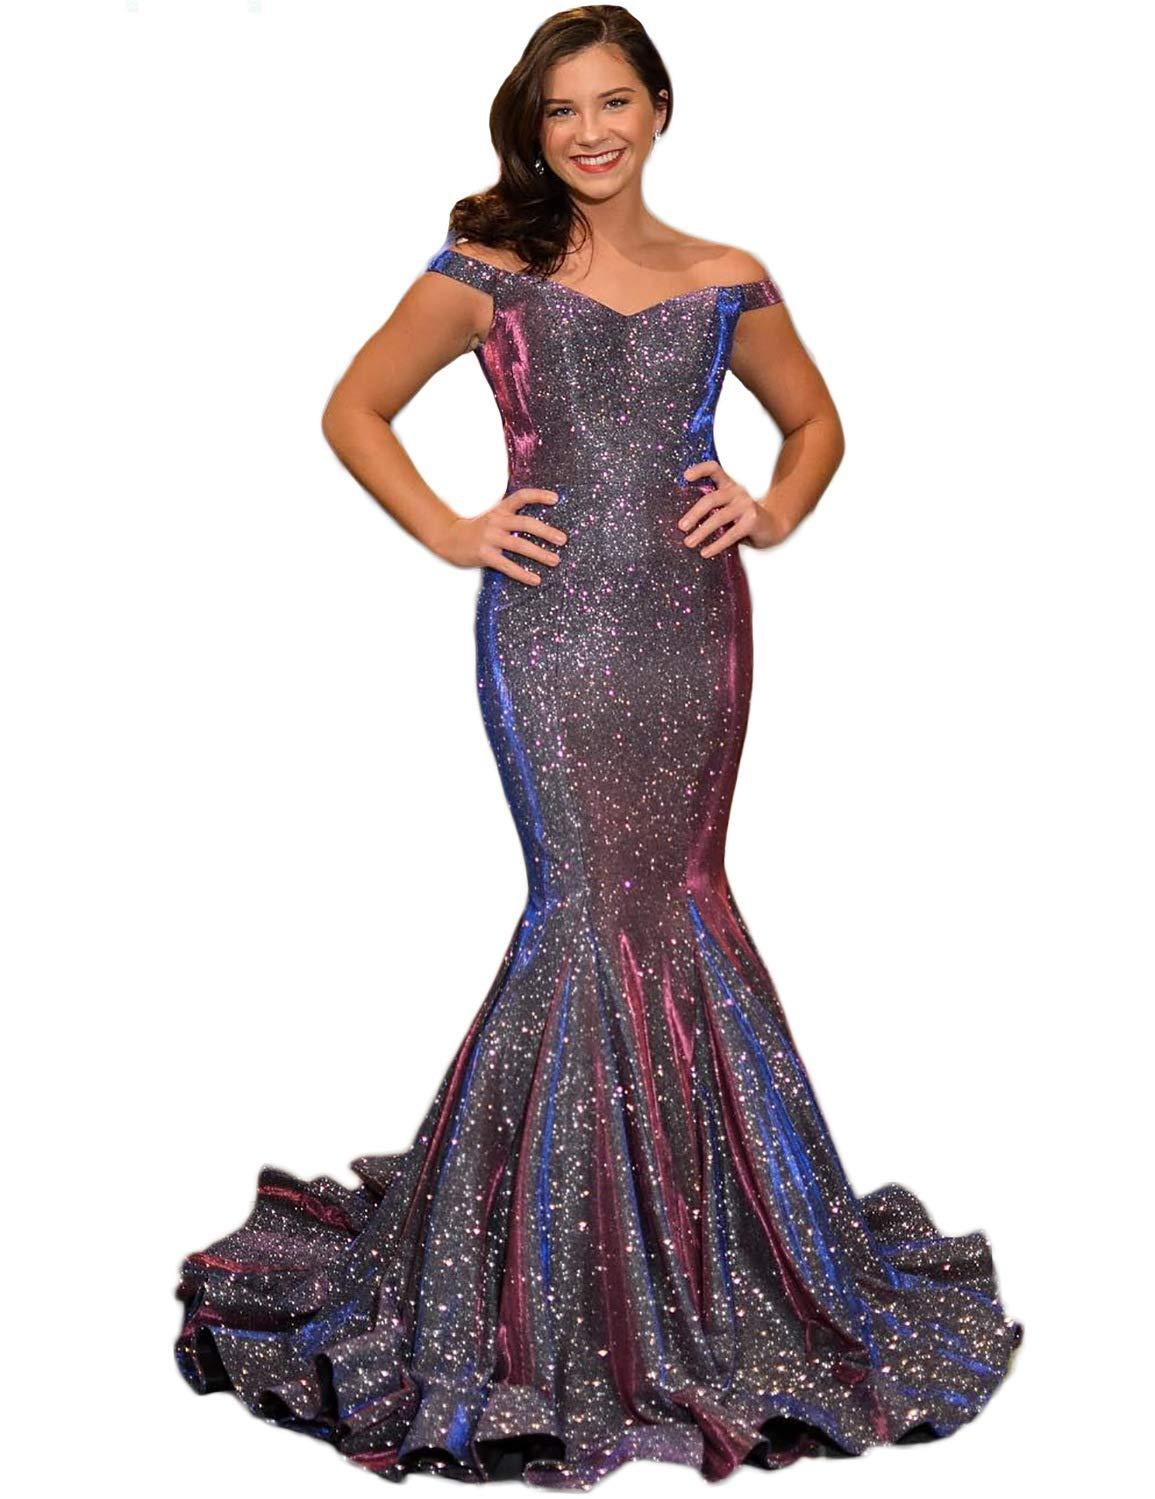 c097c483c72c Women's Sparkle Off Shoulder Prom Dresses 2019 Mermaid Long Formal ...